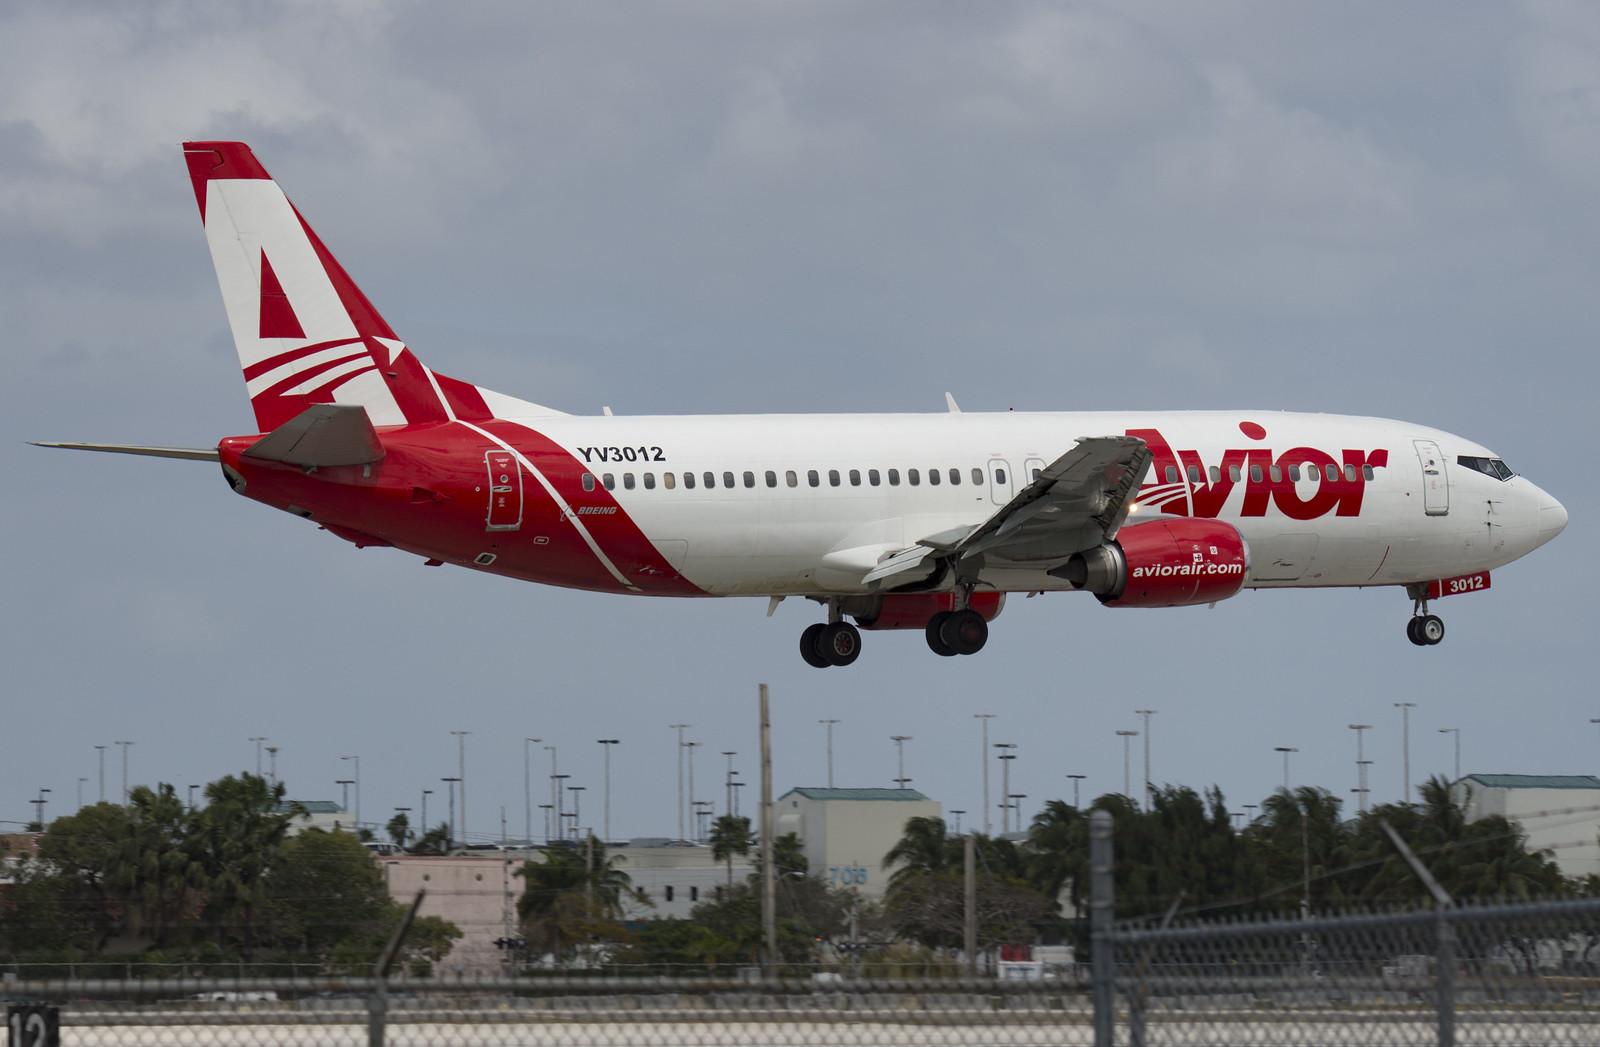 YV3012 / Boeing 737-401 / 23990/1732 / Avior Airlines